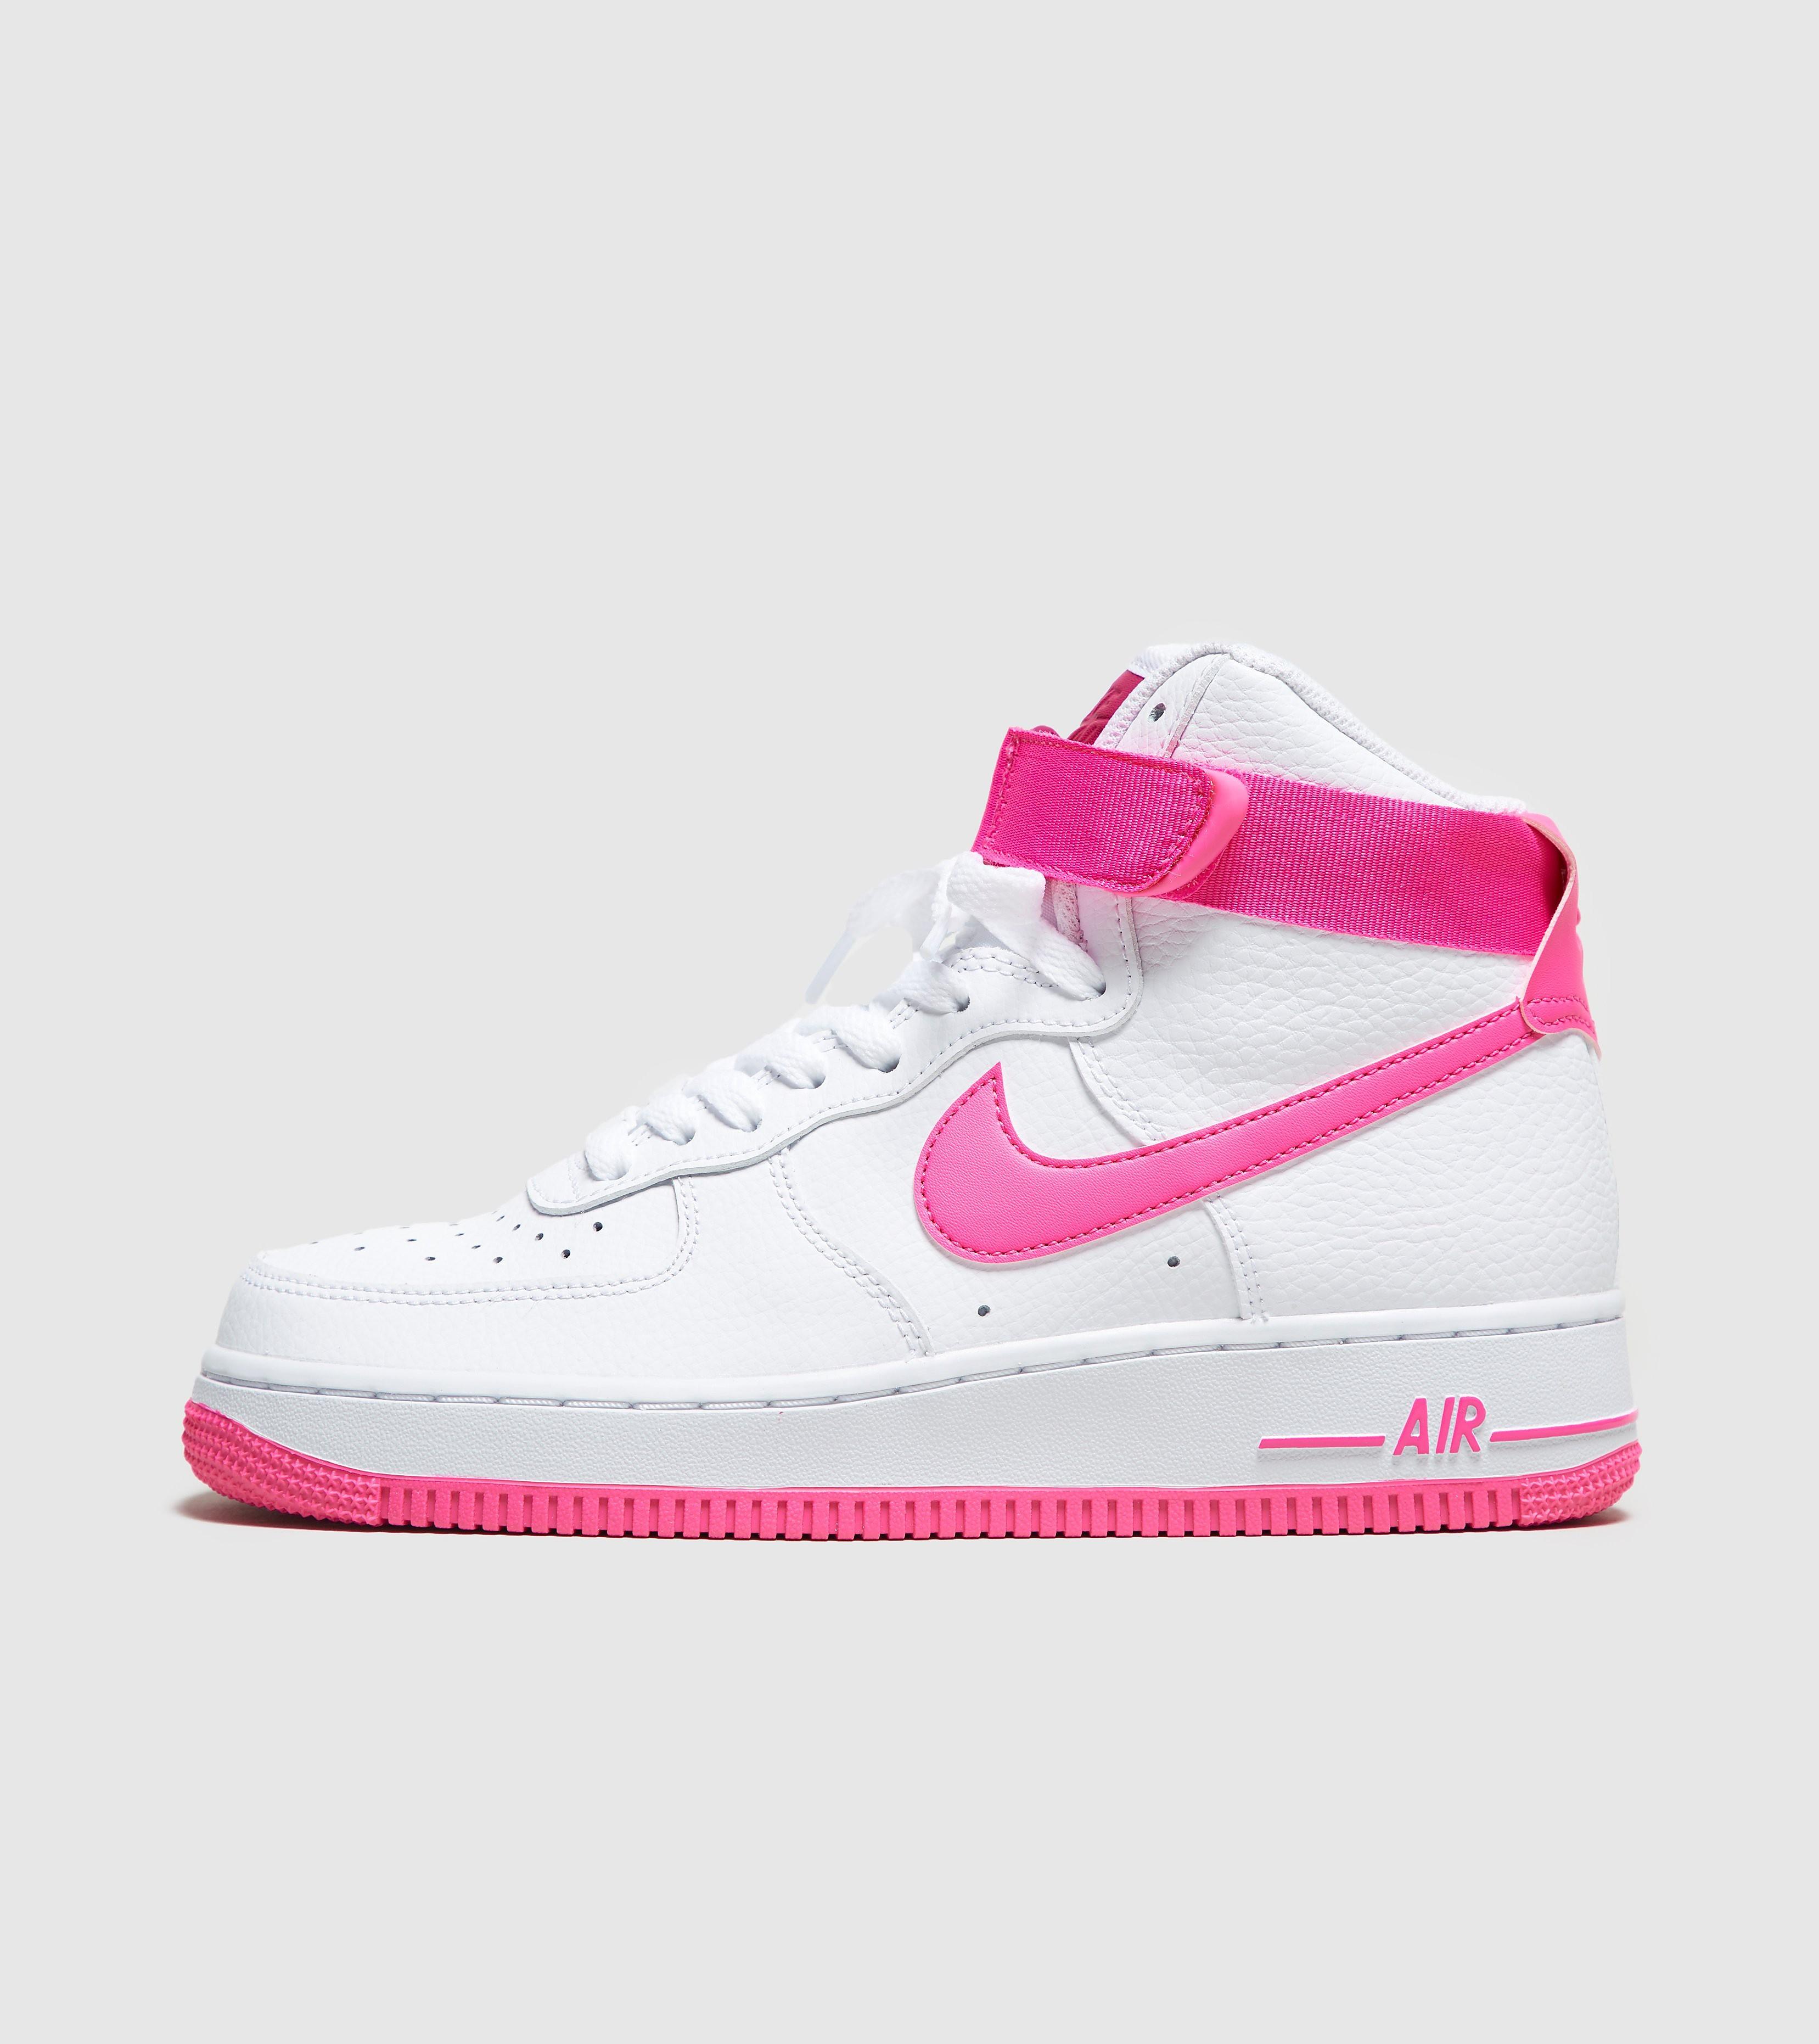 Nike Air Force 1 High Femme